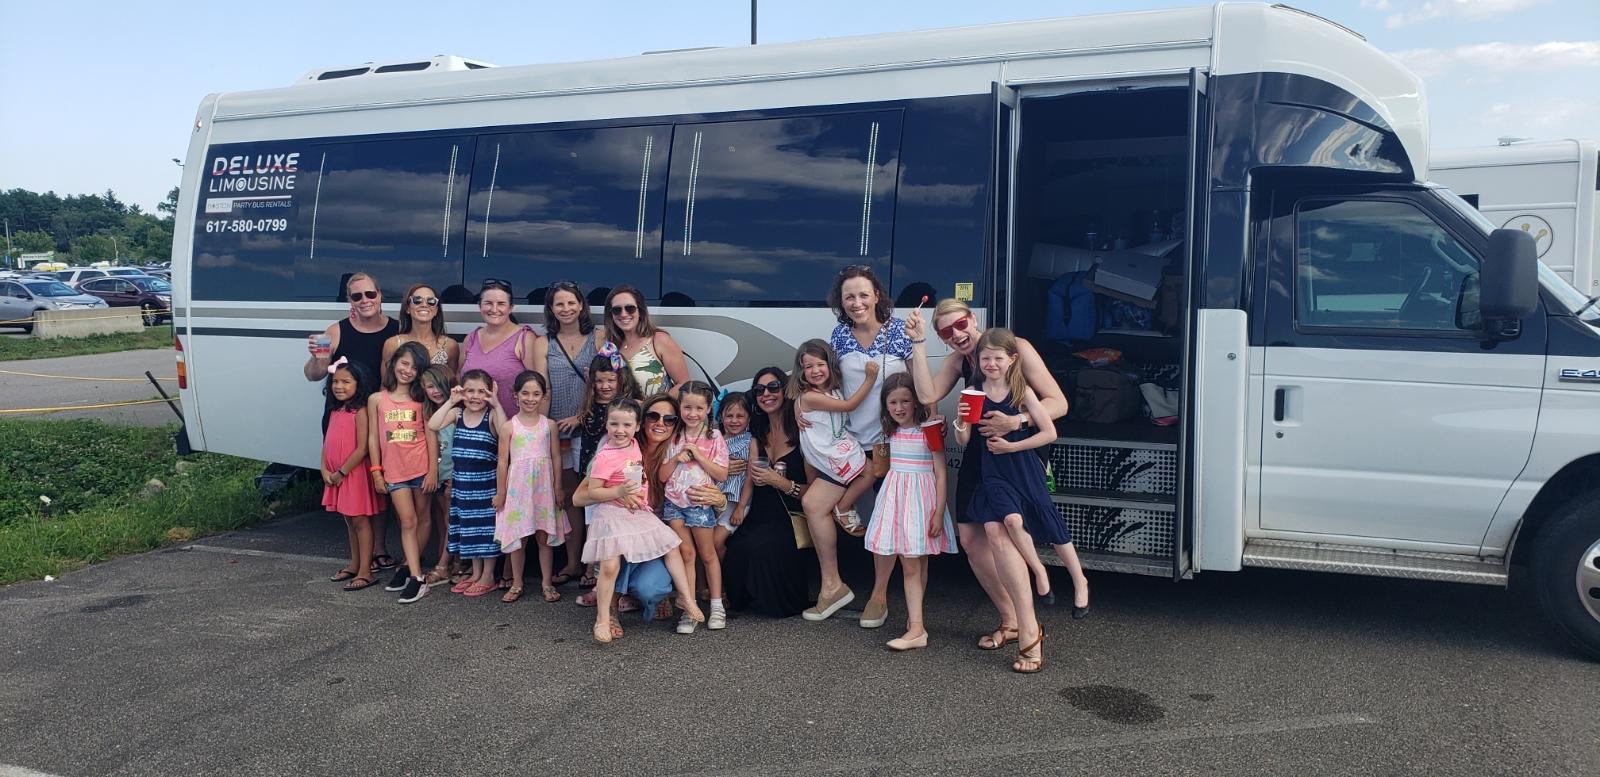 18-24-Passenger-Party-Bus-kids-party